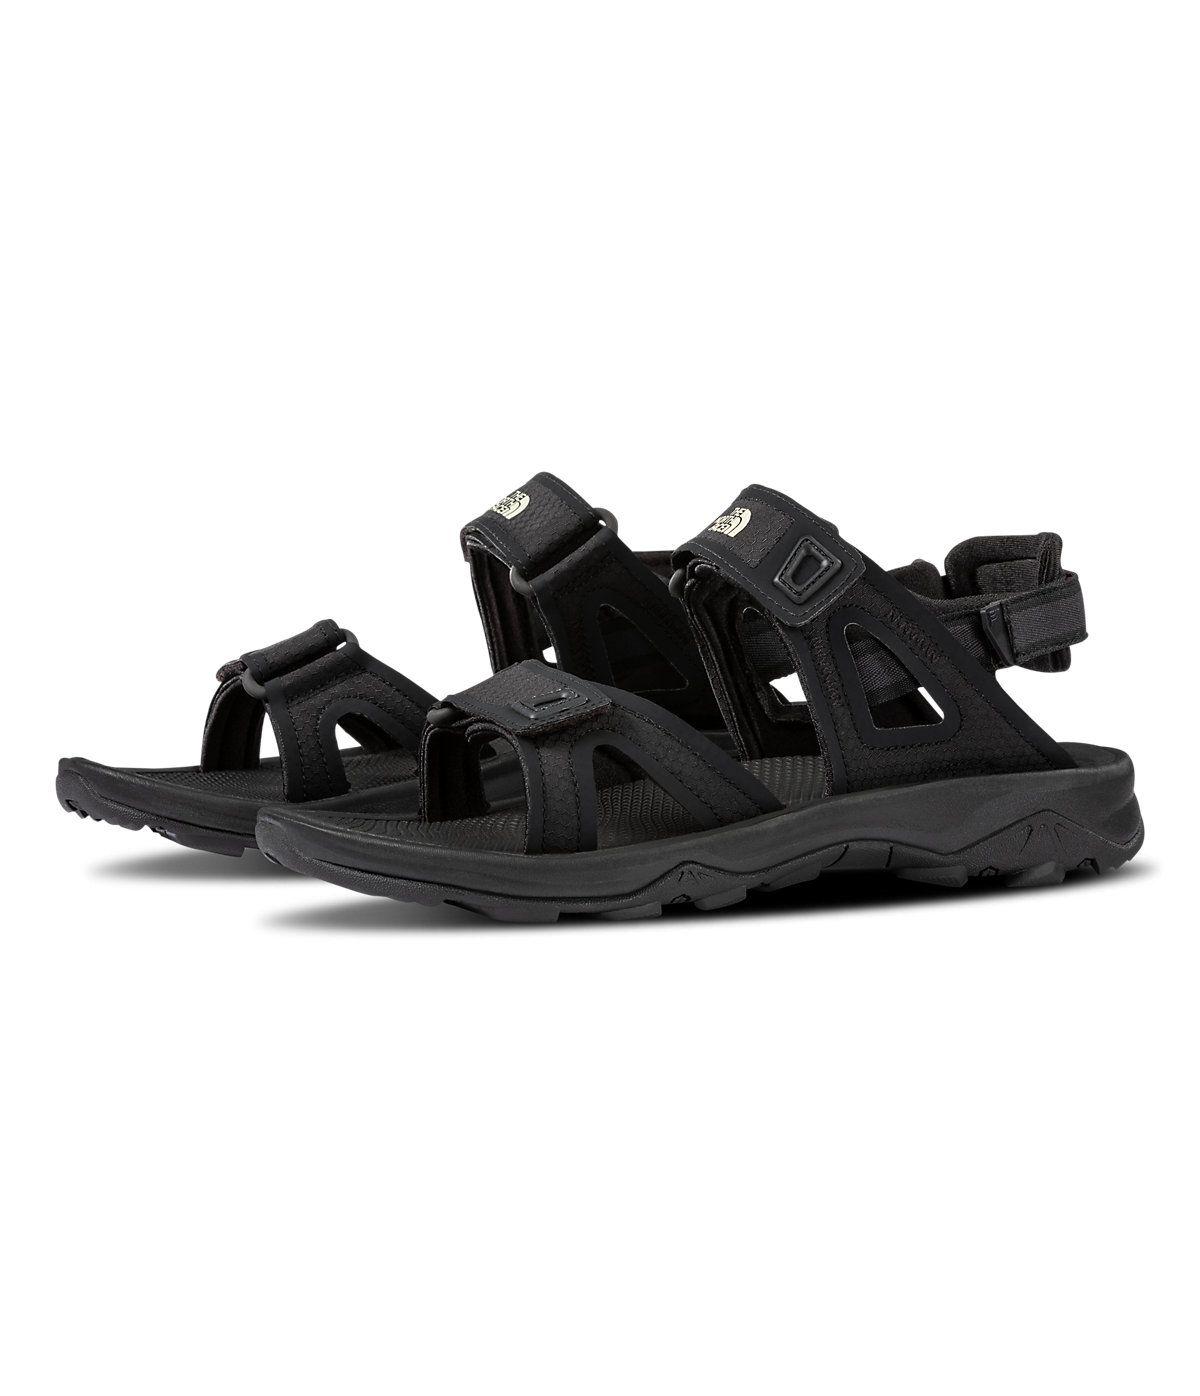 7ffb43cdd Men's hedgehog sandal ii in 2019 | Products | Sandals, Men, Hedgehog